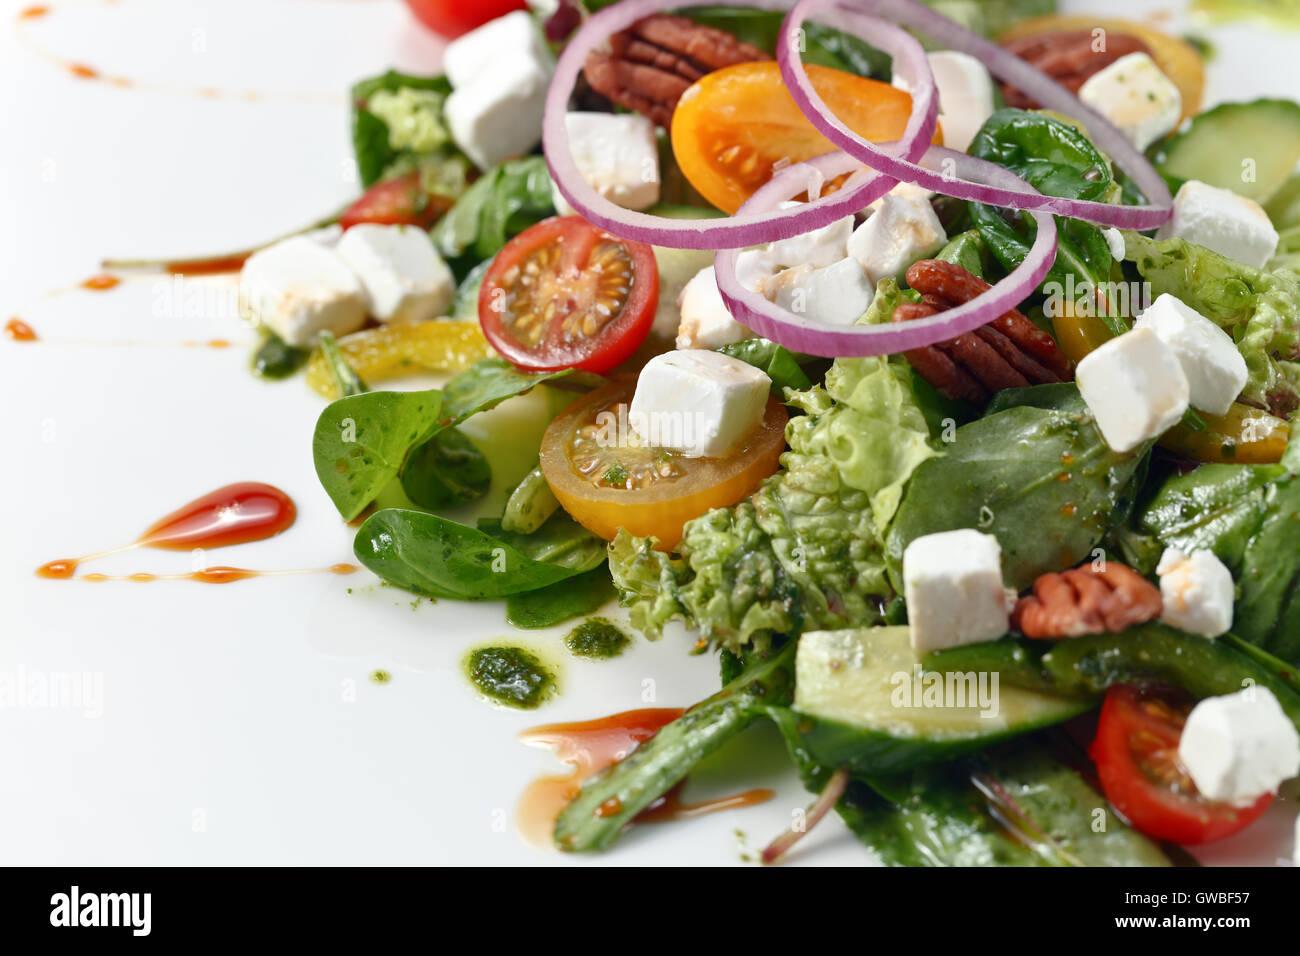 green salad with pesto sauce and mozzarella - Stock Image